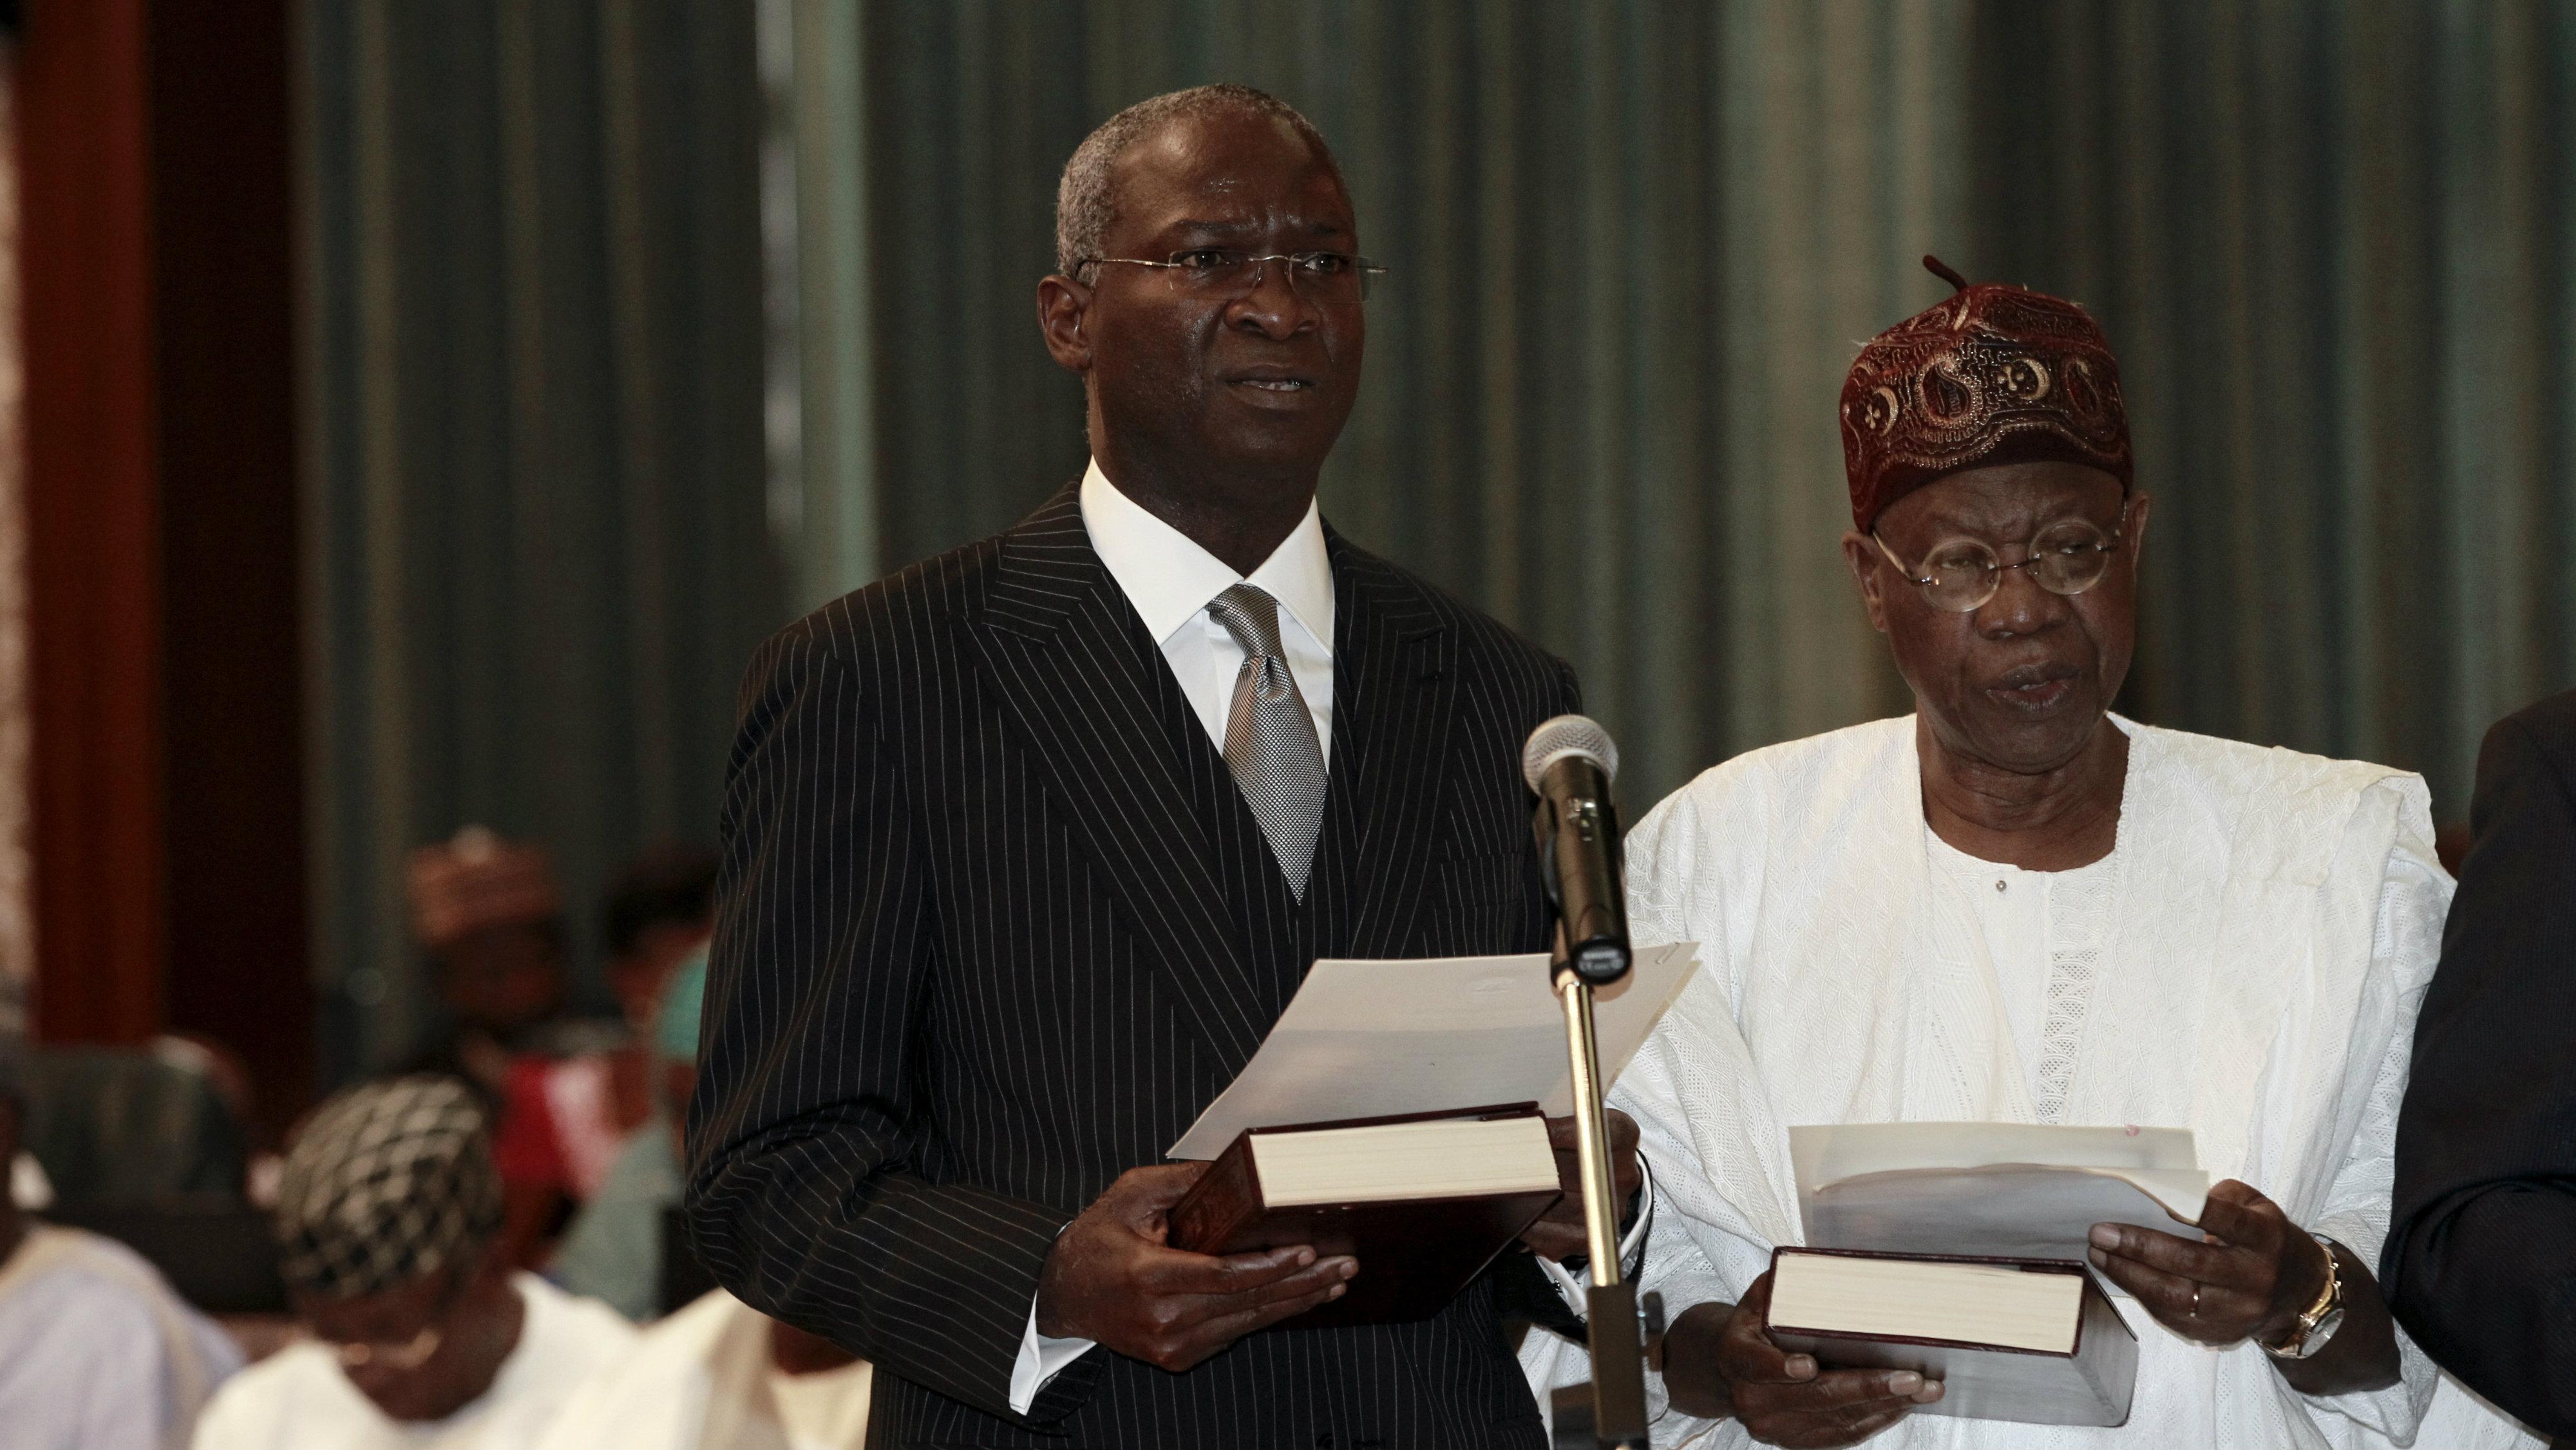 Nigeria's president Buhari has sworn in a new cabinet at